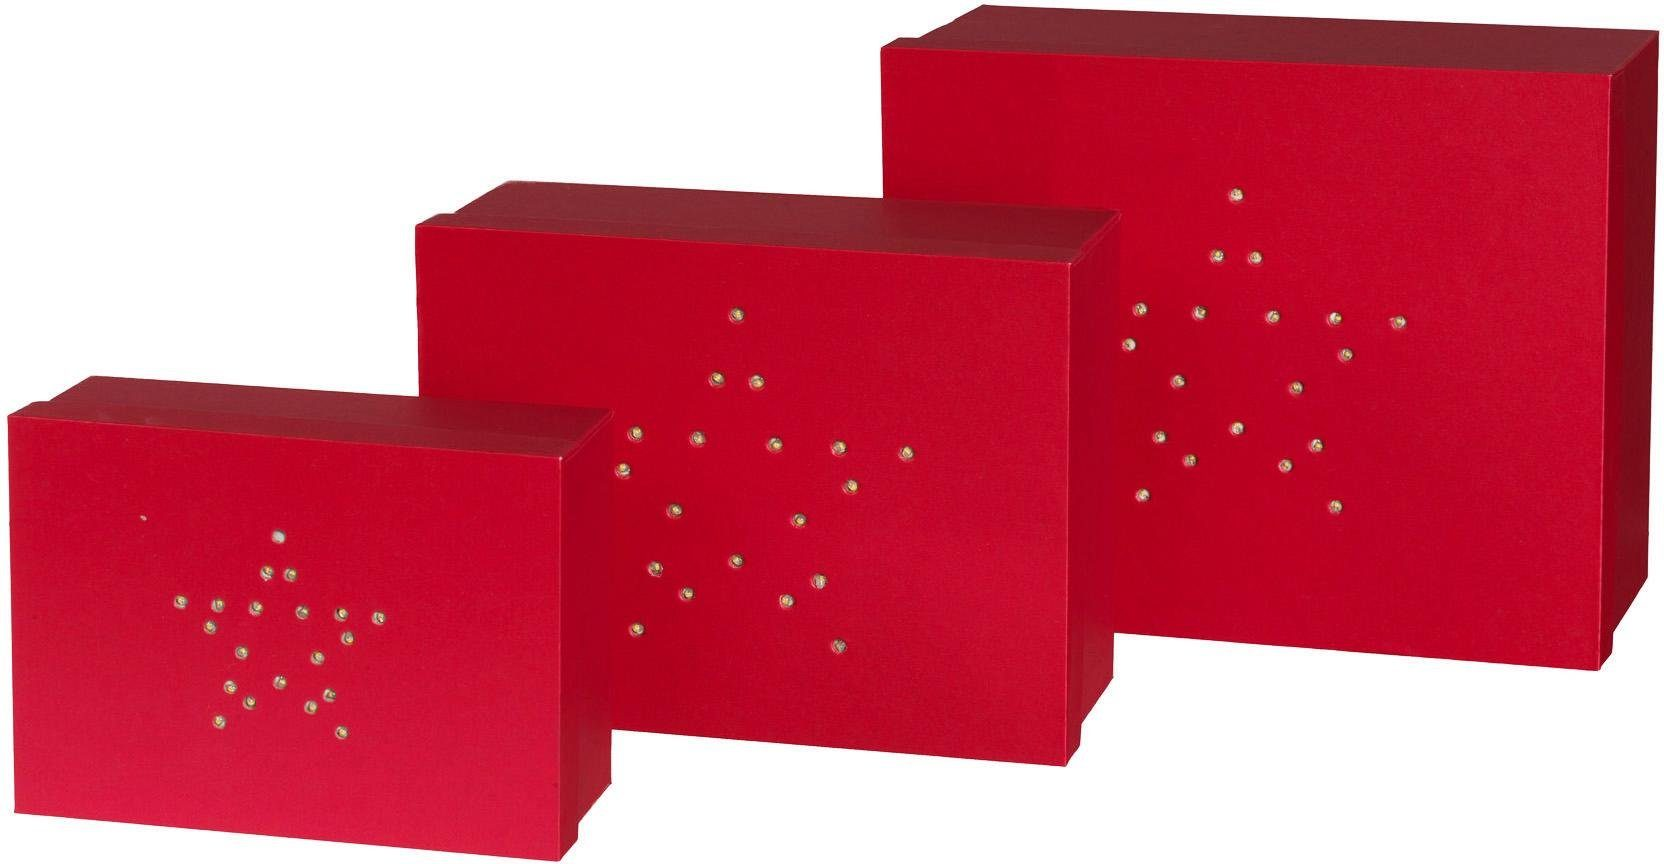 Geschenkbox 3er Set mit LED Beleuchtung